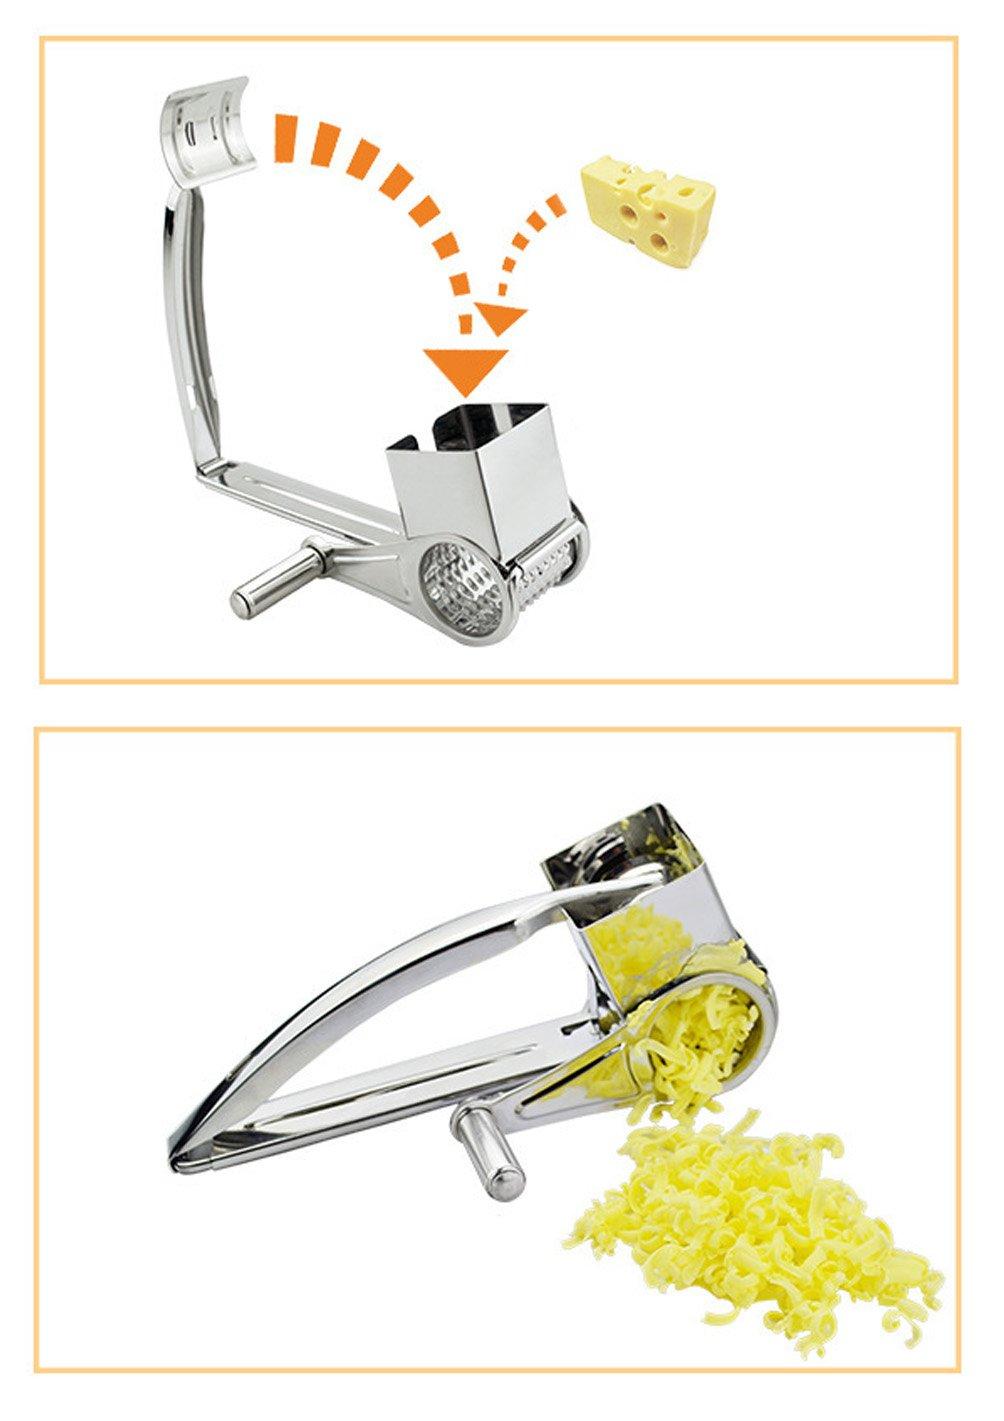 Acier inoxydable citron yfbear Rotation R/âpe zesteur R/âpe acier inoxydable pour fromage Medium l/égumes Silber